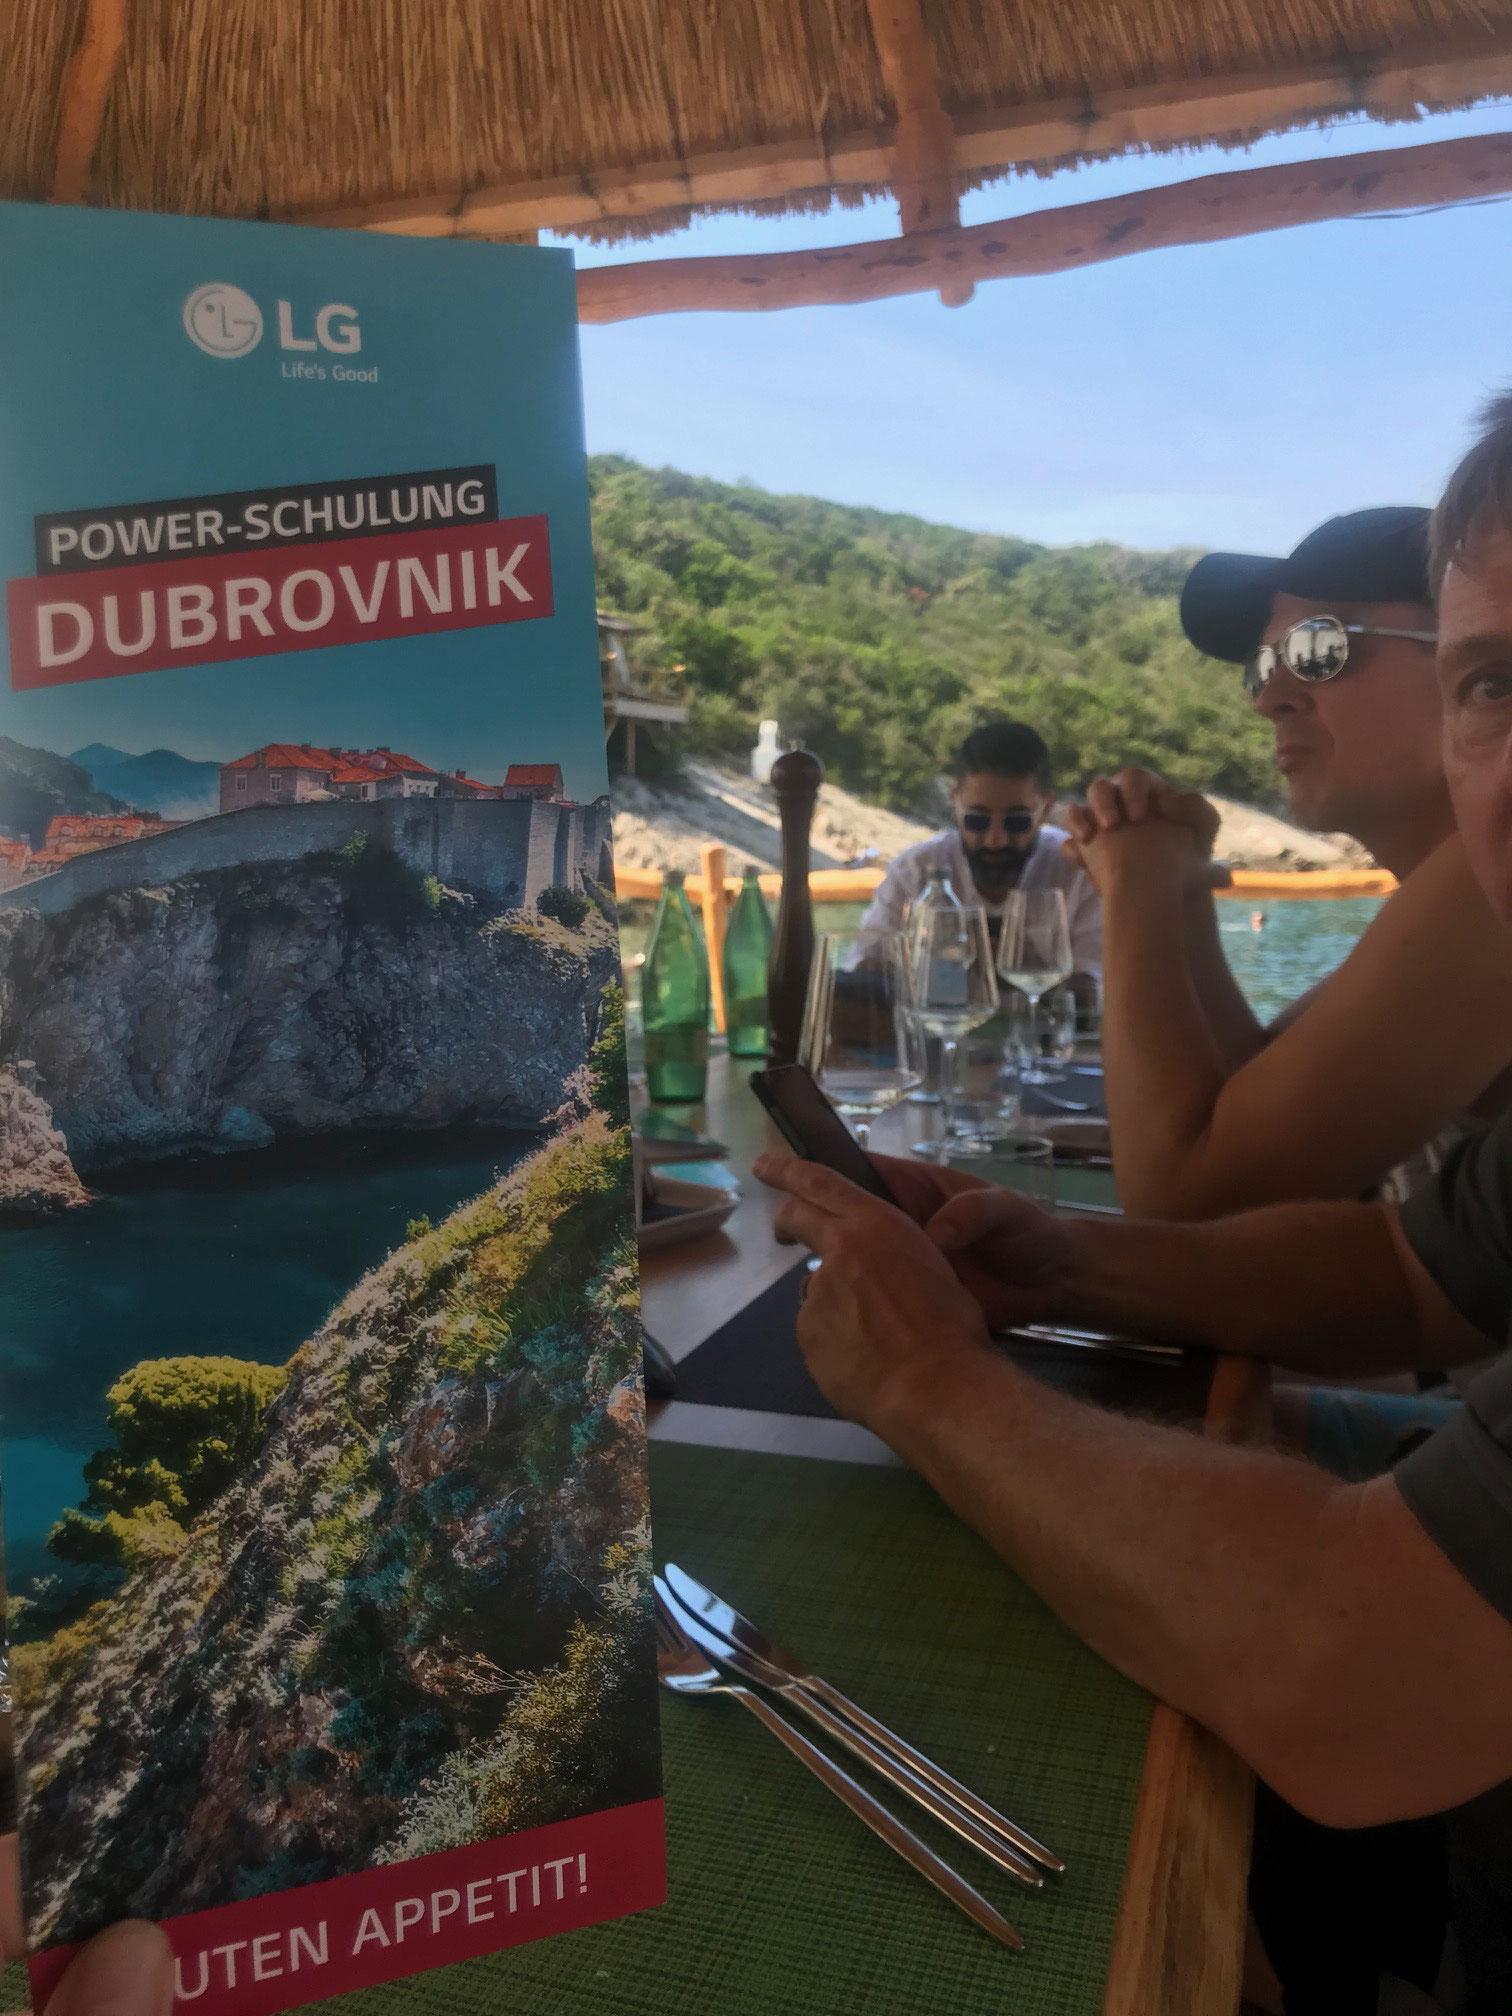 LG Electronics & Expert - Expertentage Produktschulung, 2018, Dubrovnik